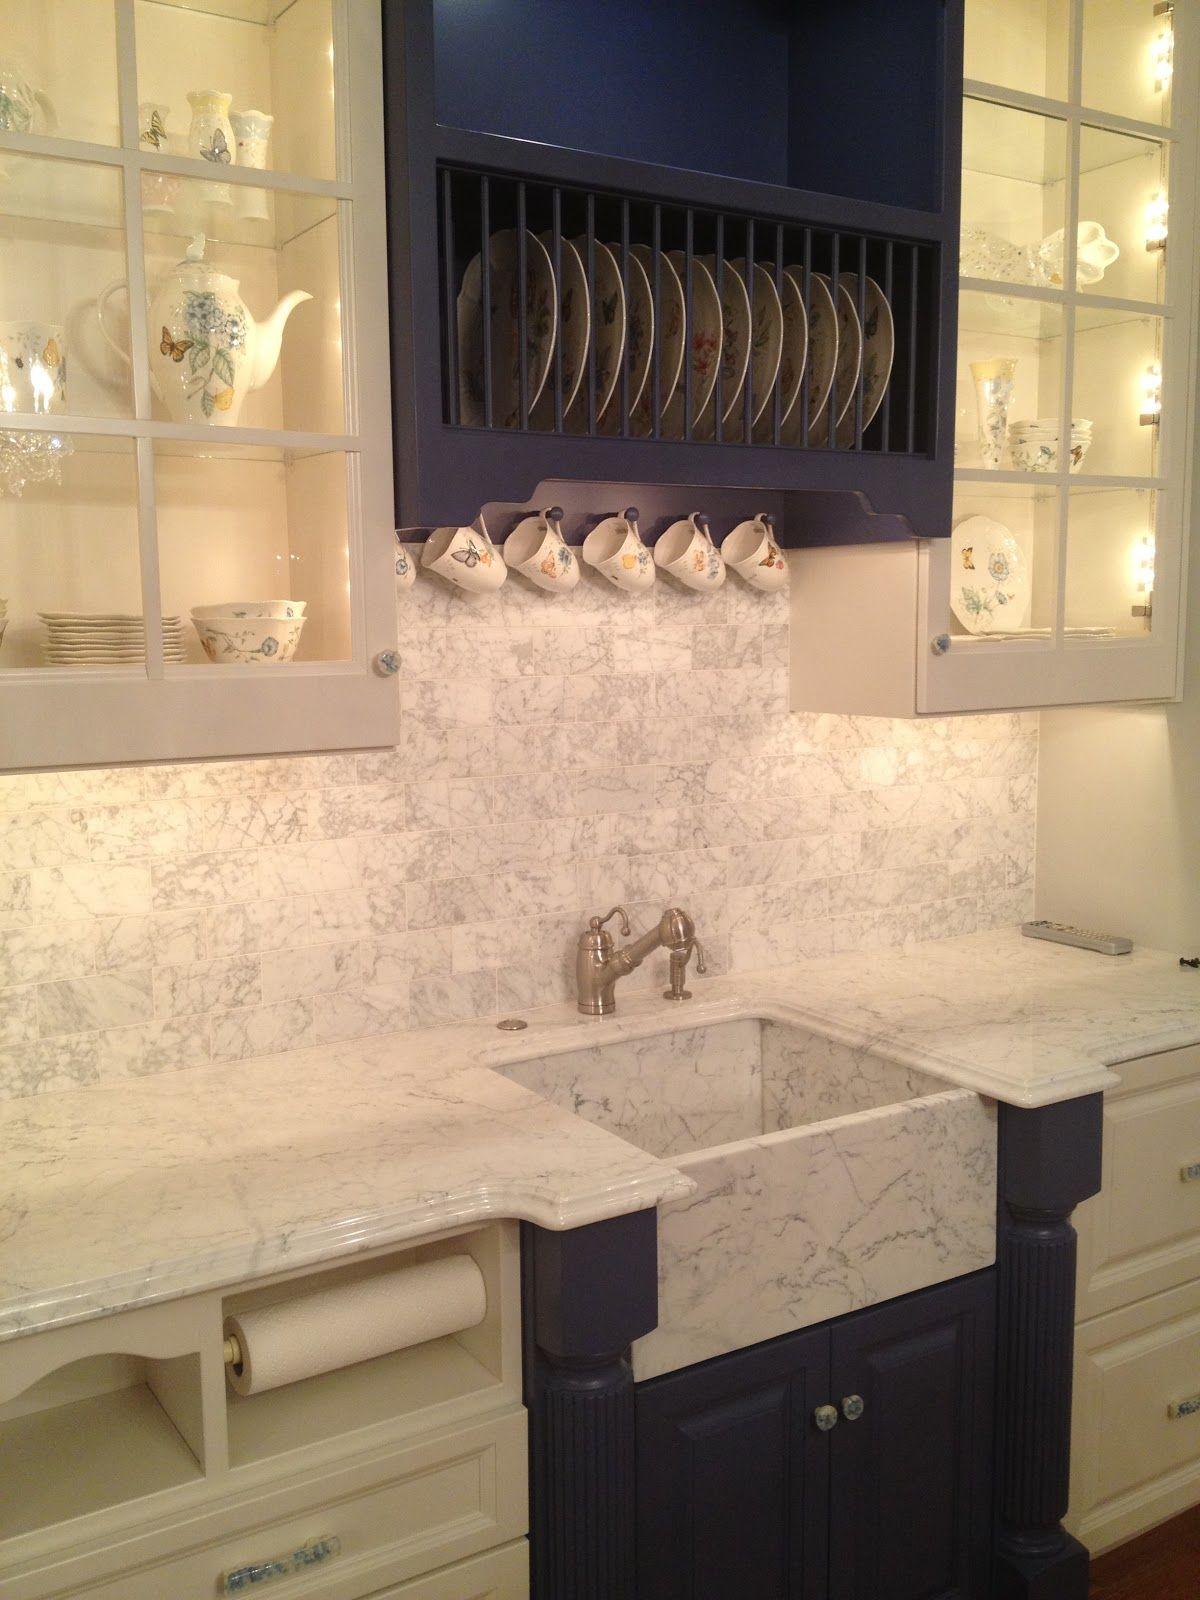 Kitchen sink no window  baunderie marble  cuisine  pinterest  china cabinets kitchens